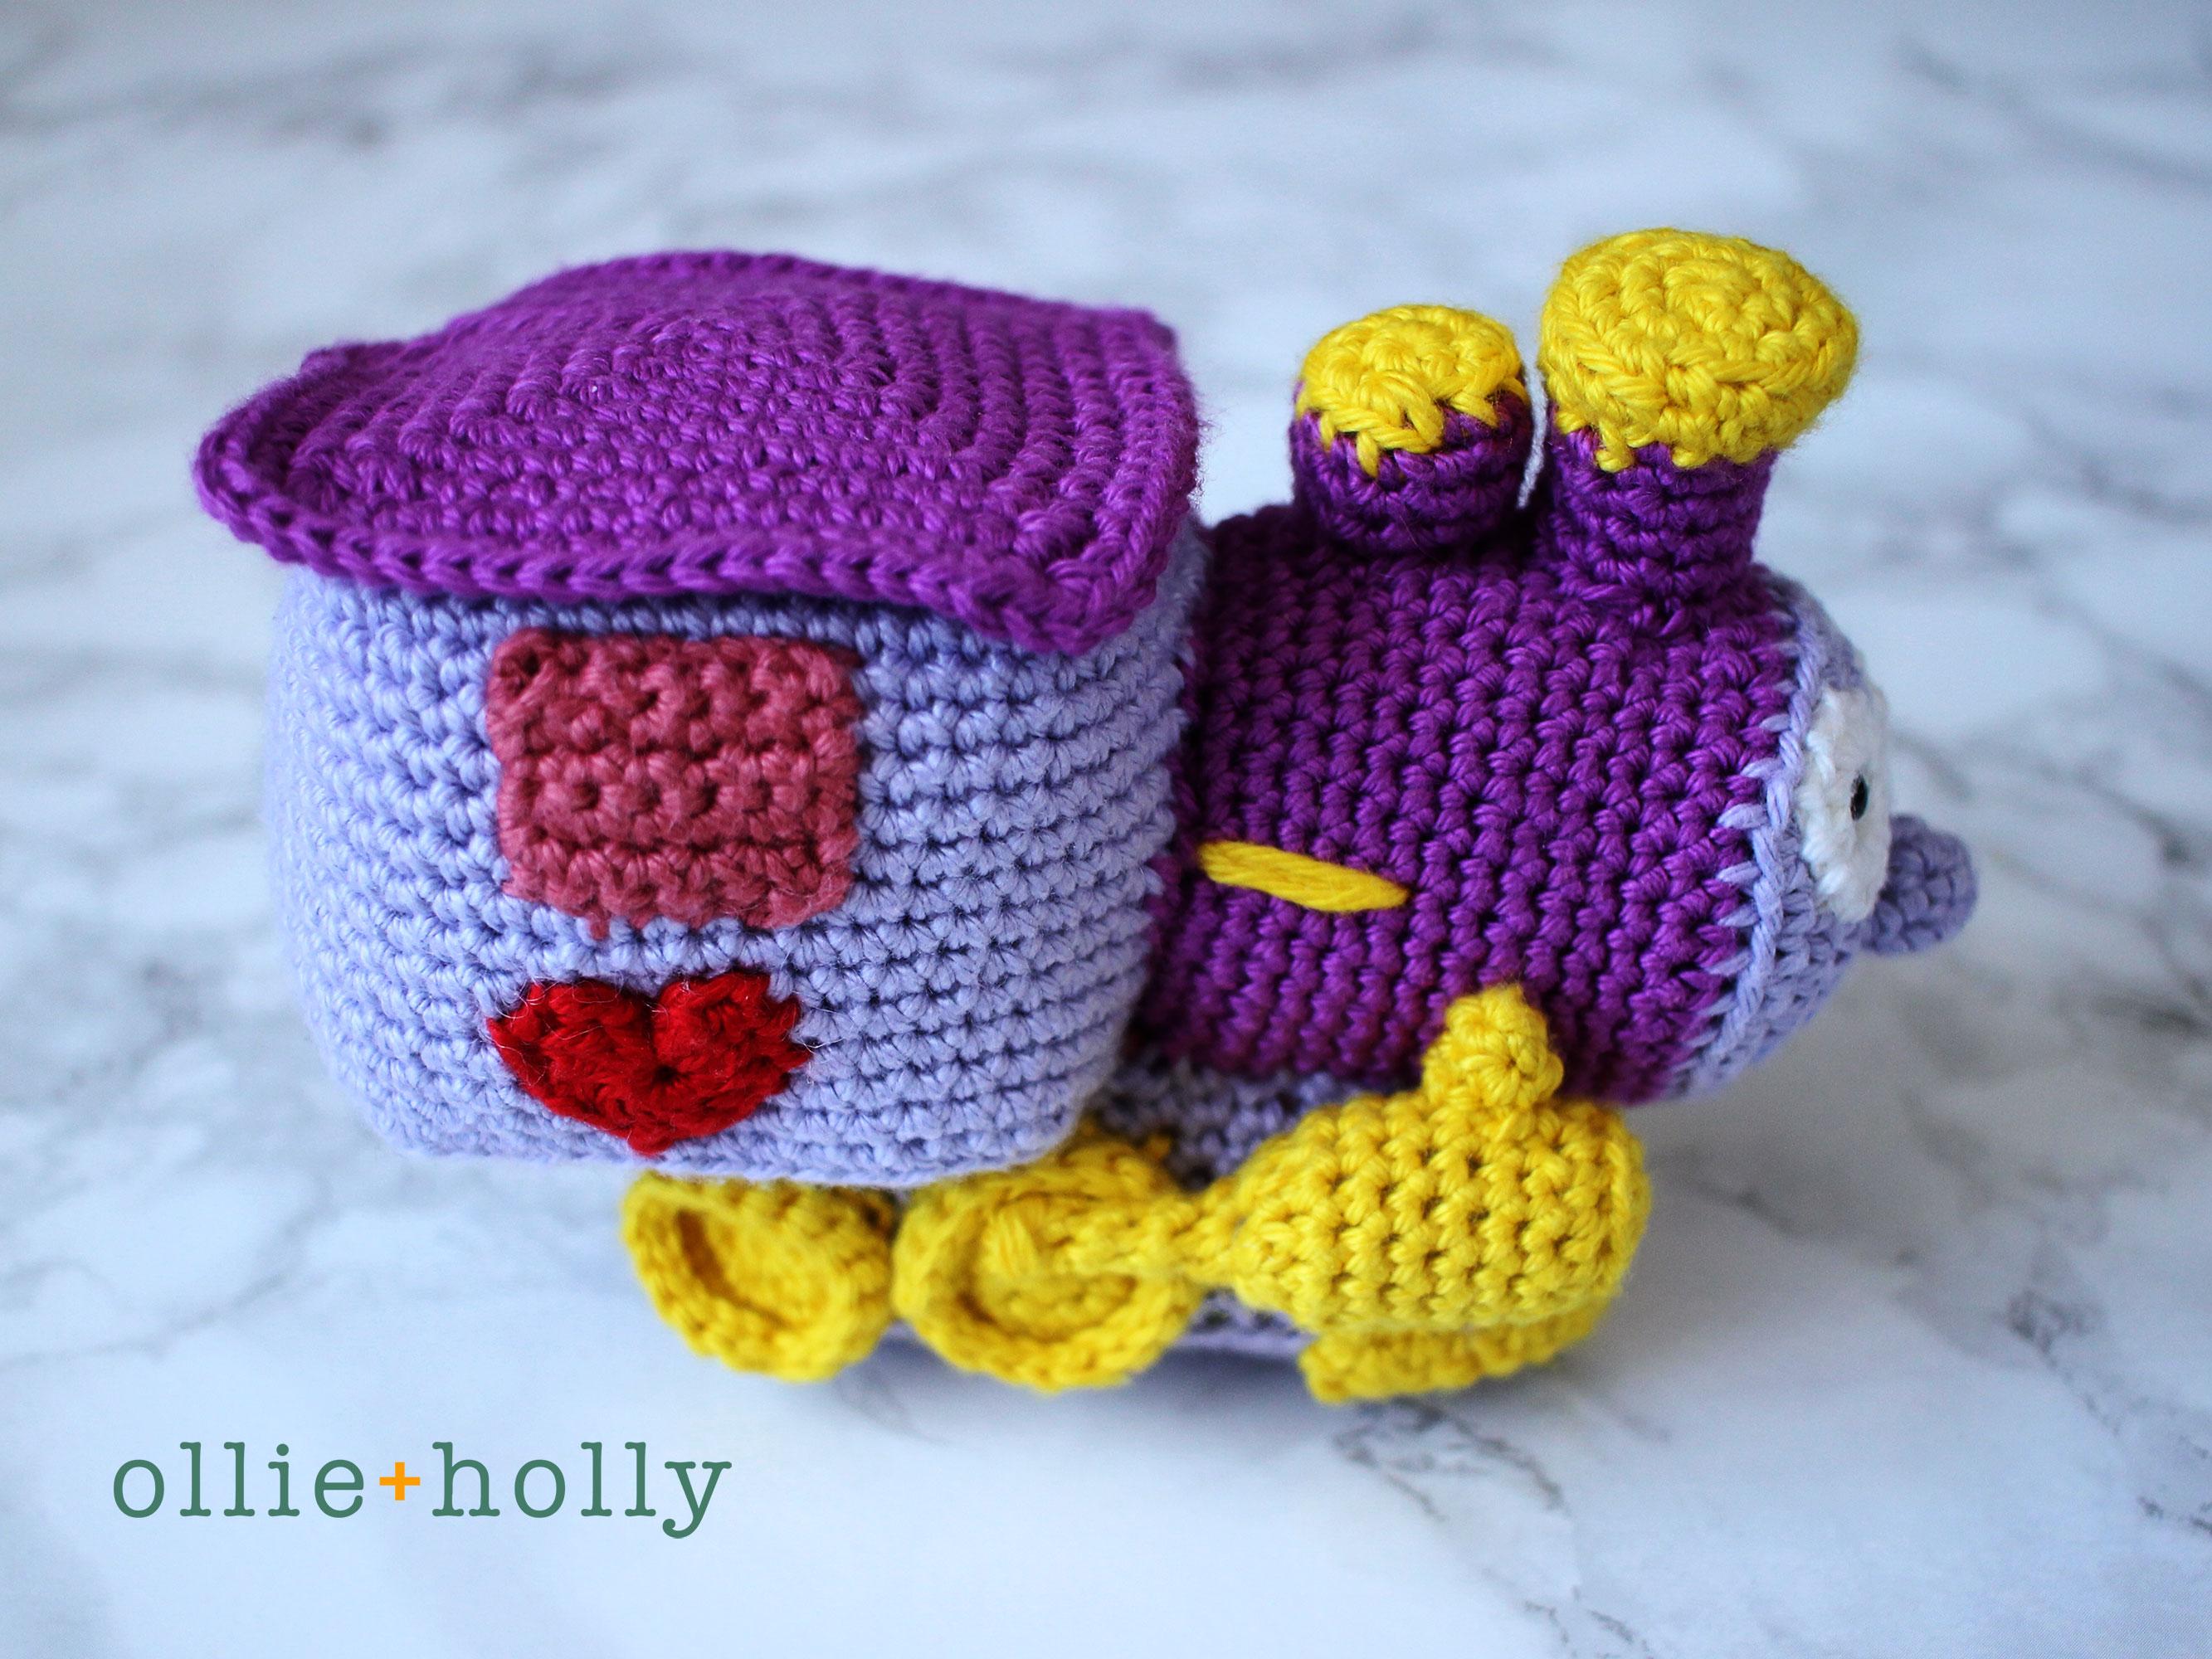 The Simpsons I Choo Choo Choose You Amigurumi Crochet Pattern Side View